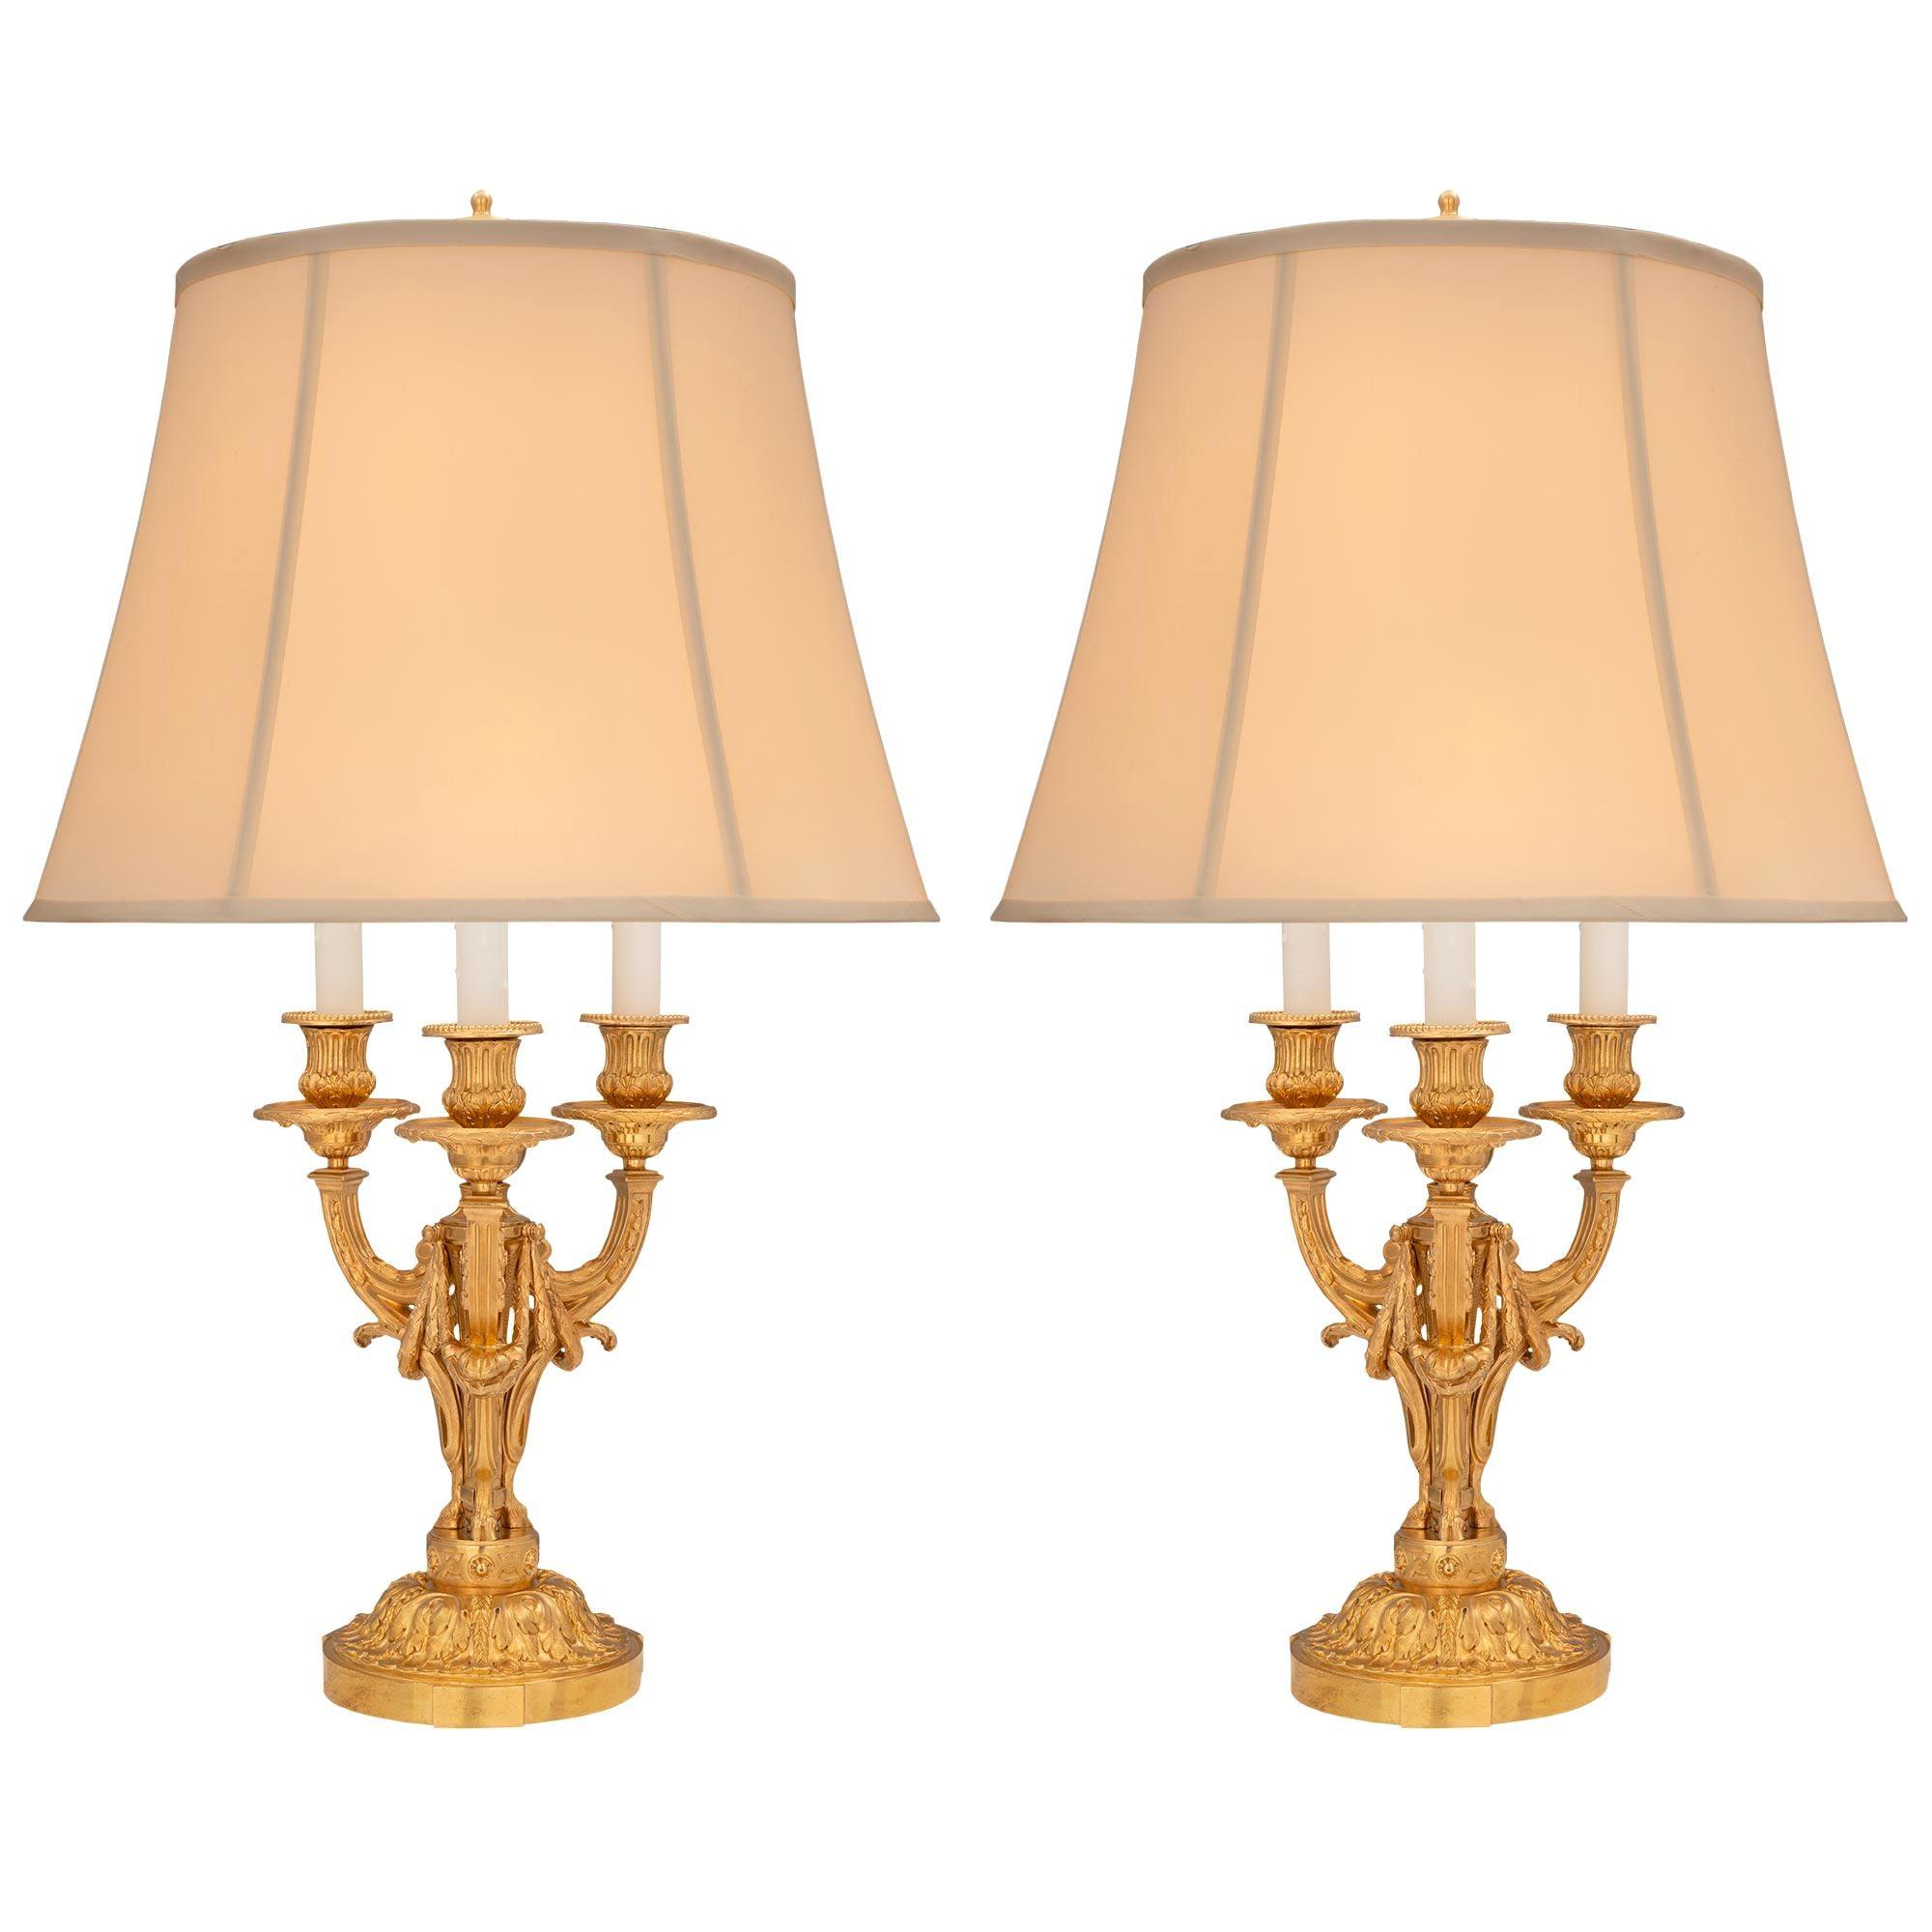 Pair of French 19th Century Louis XVI St. Belle Époque Period Ormolu Lamps